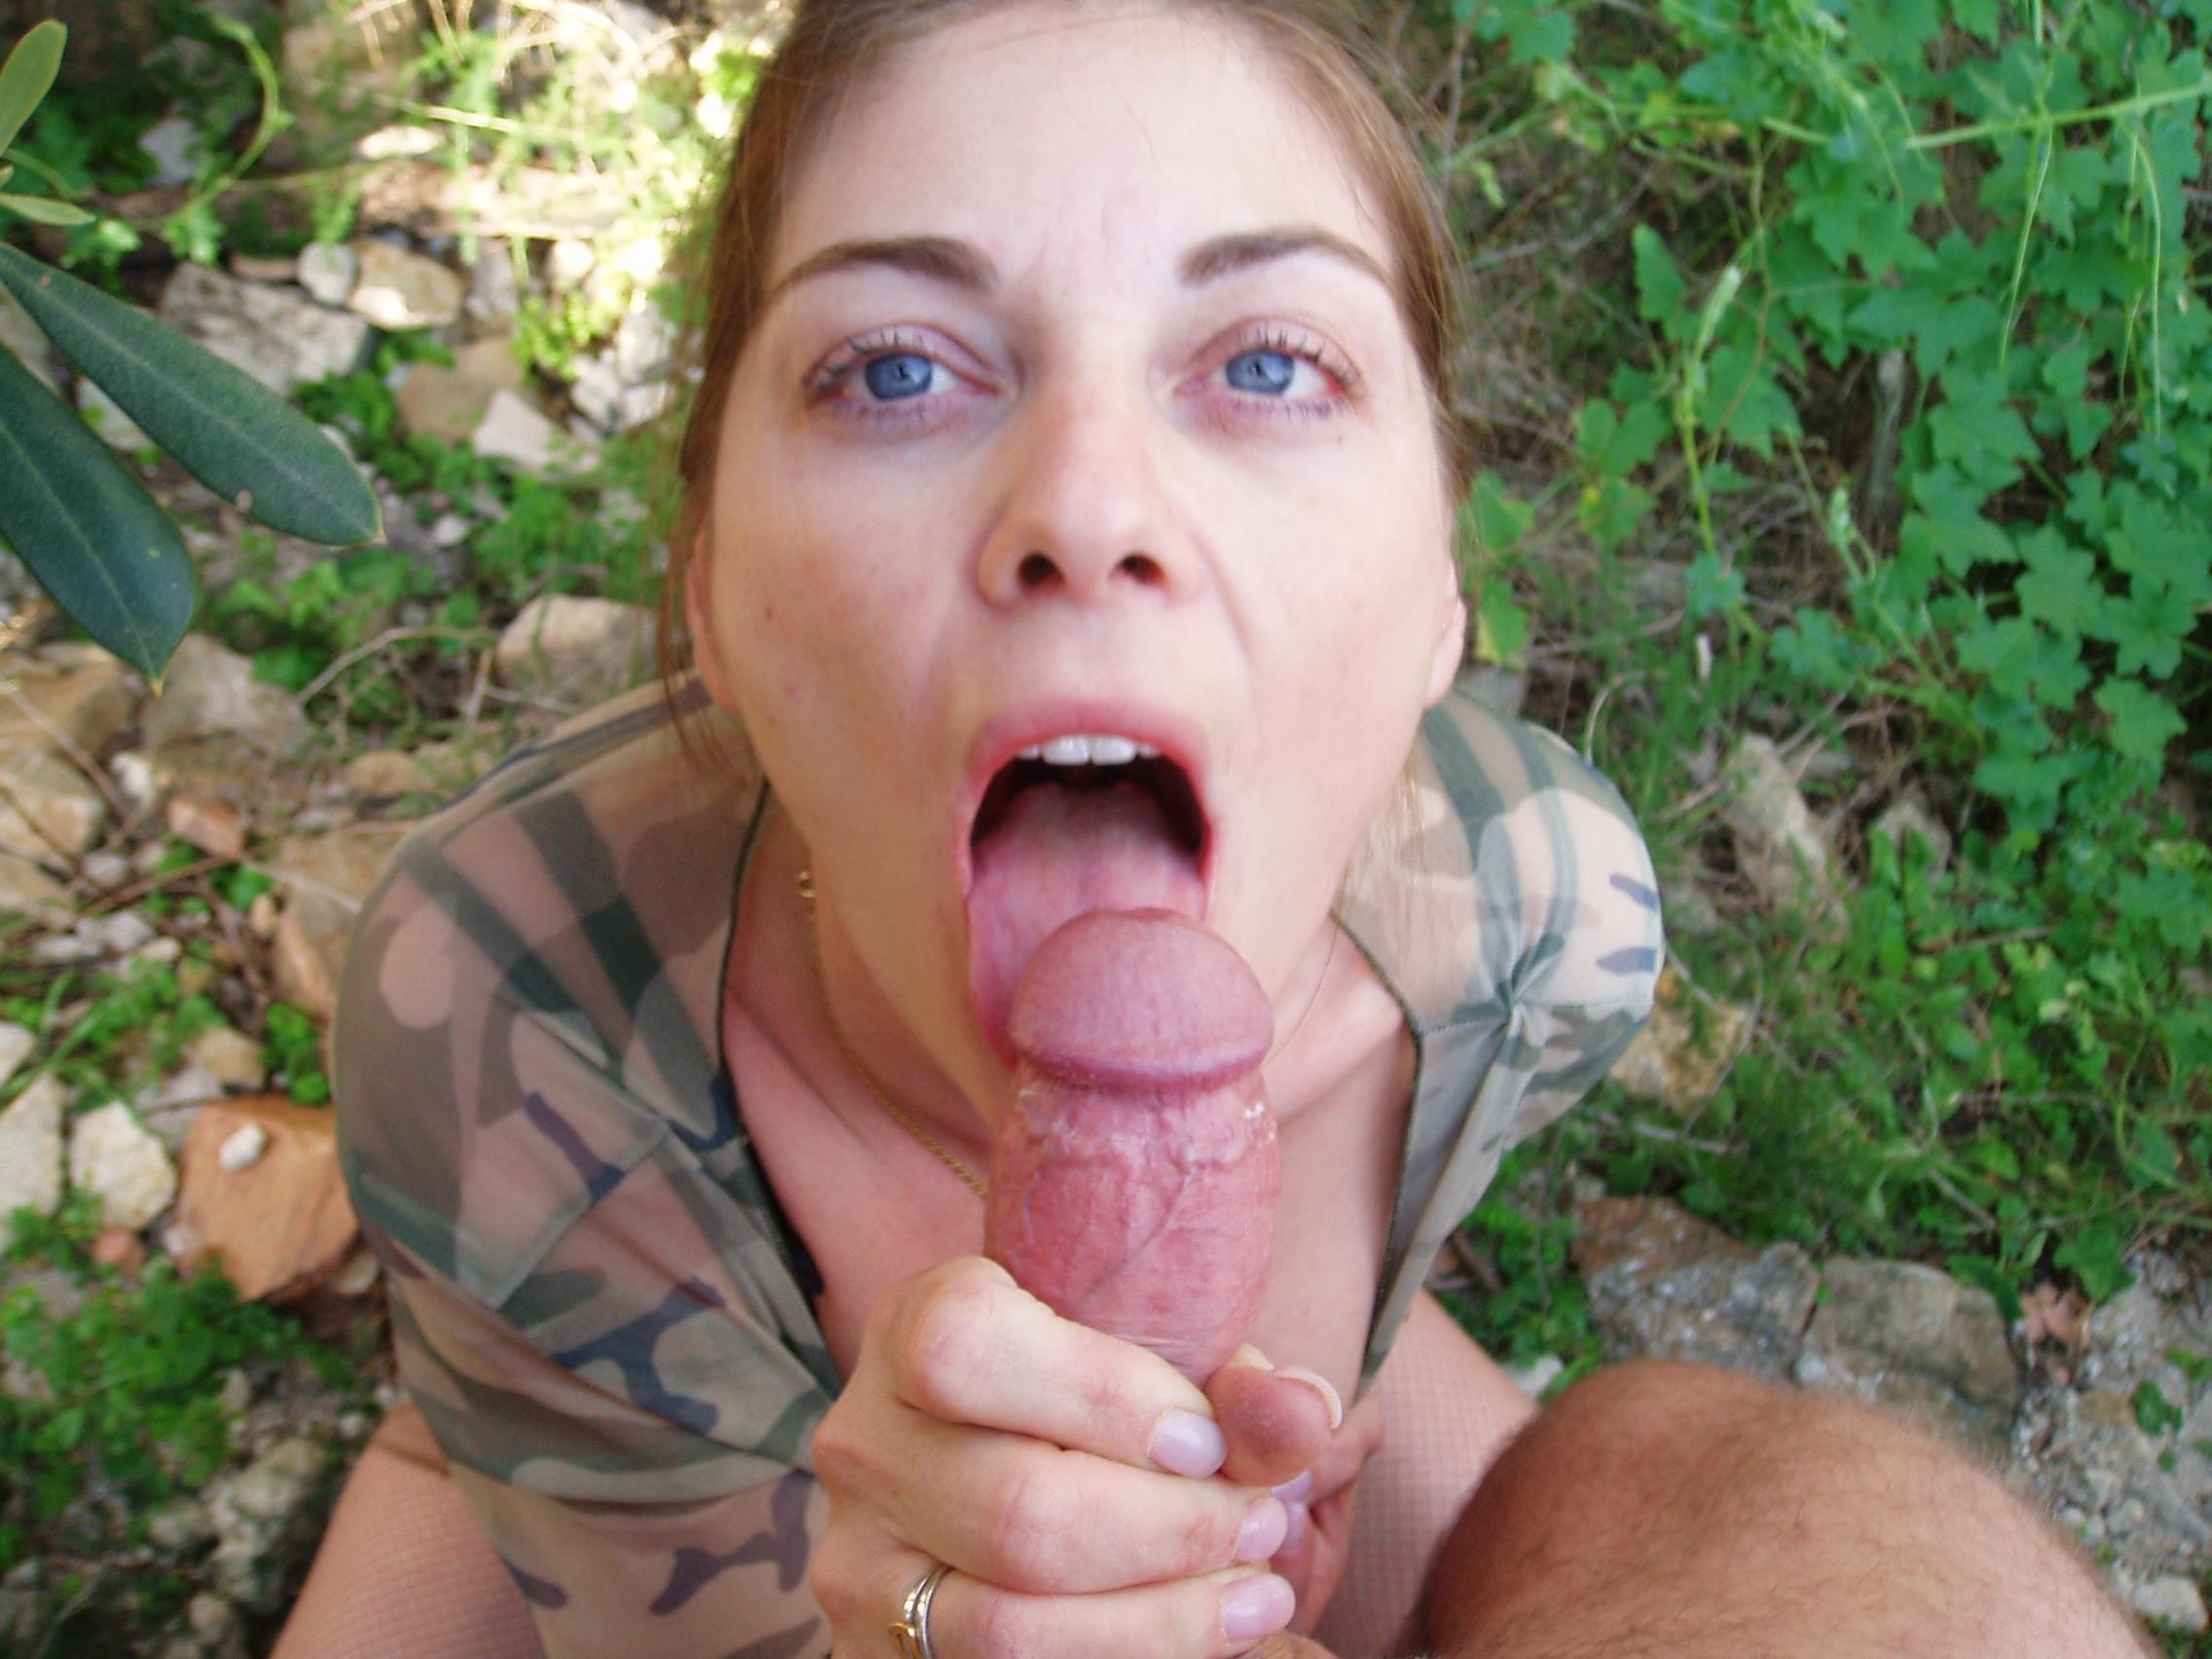 Outdoor blow job cum in mouth